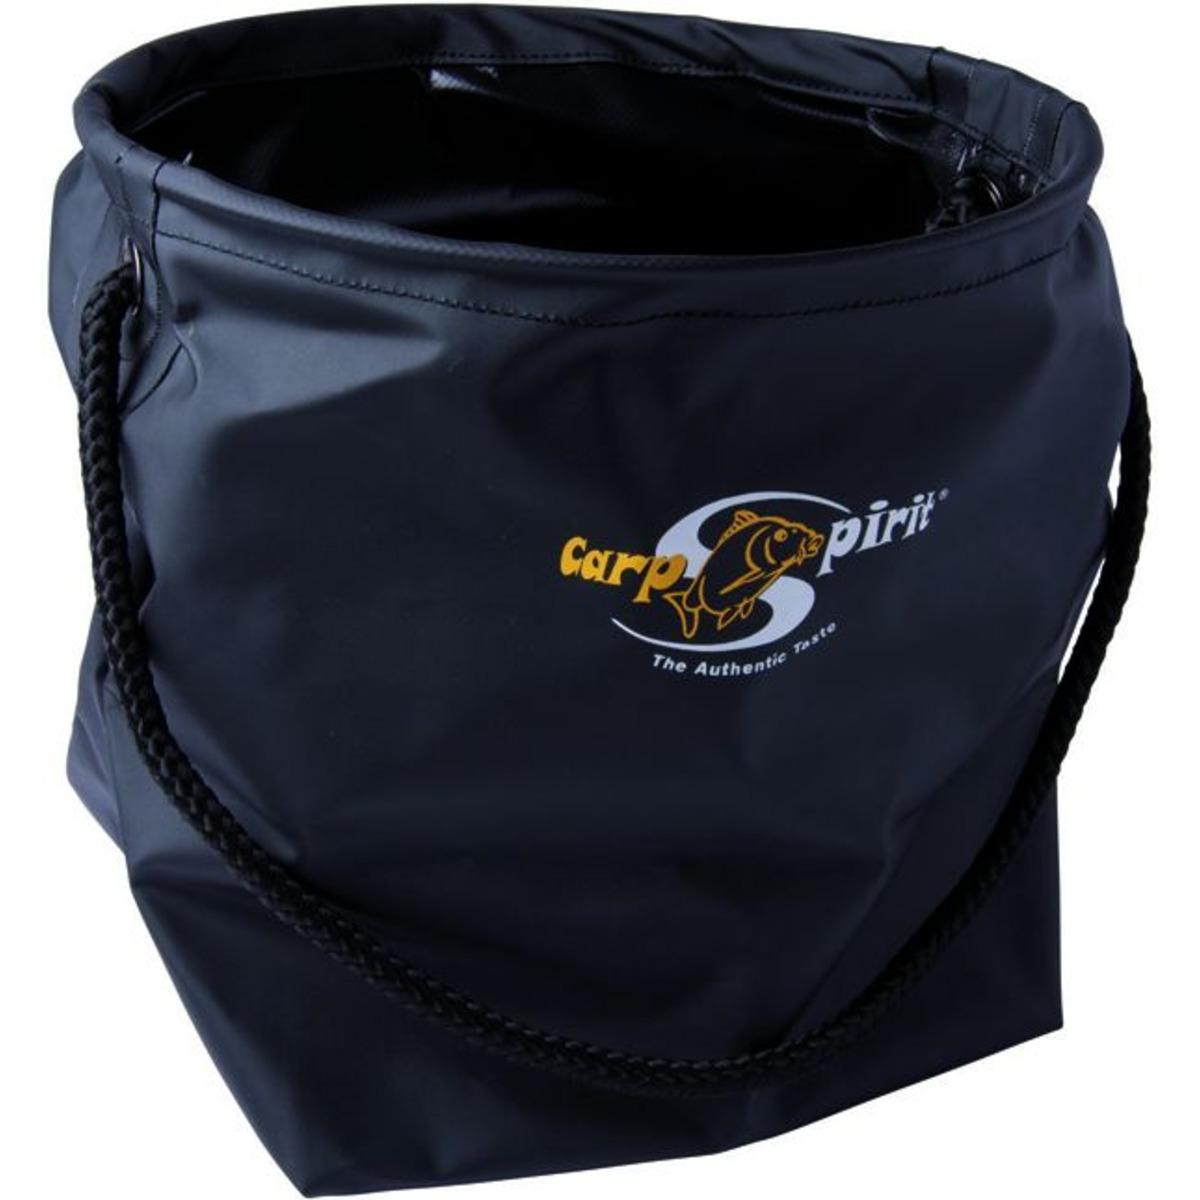 Carp Spirit Foldable Bucket - 6 lt